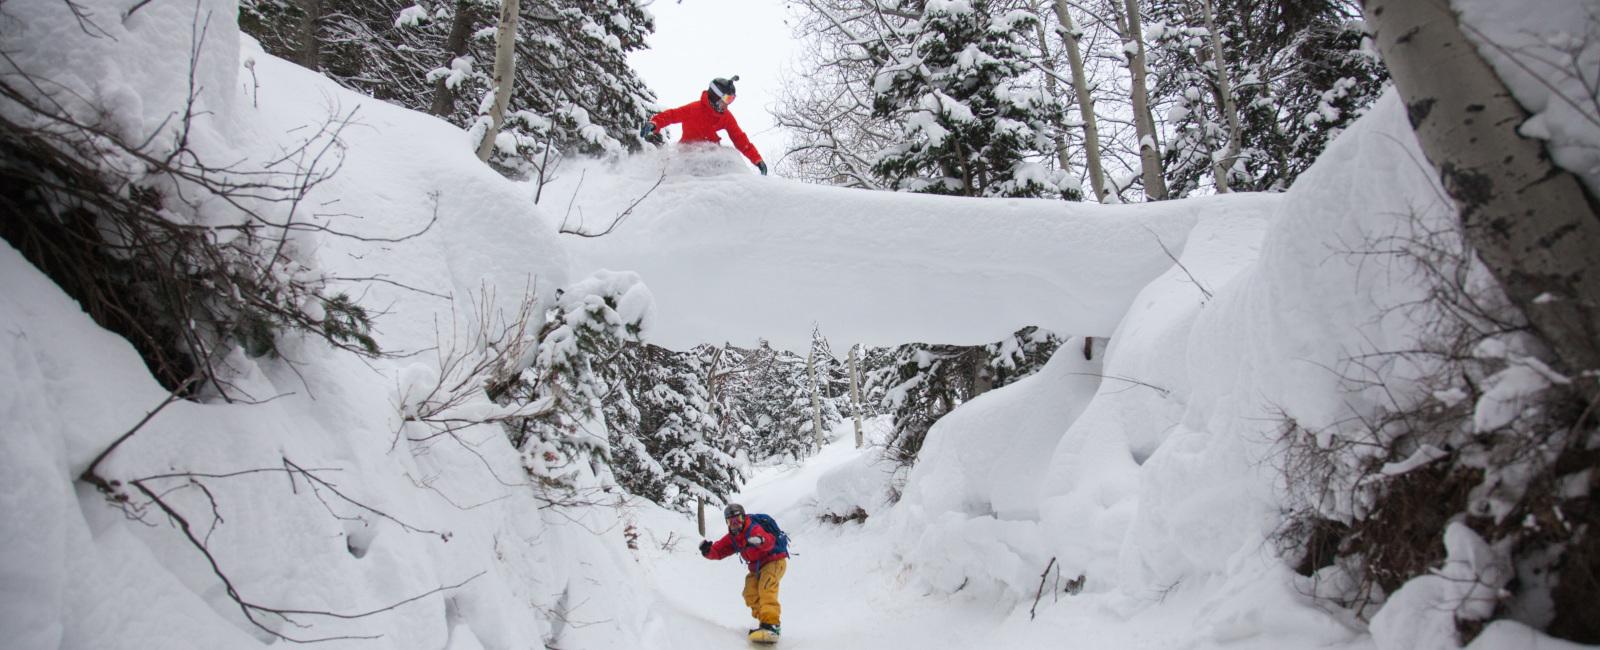 Sundance Film Festival Brings Epic Pow